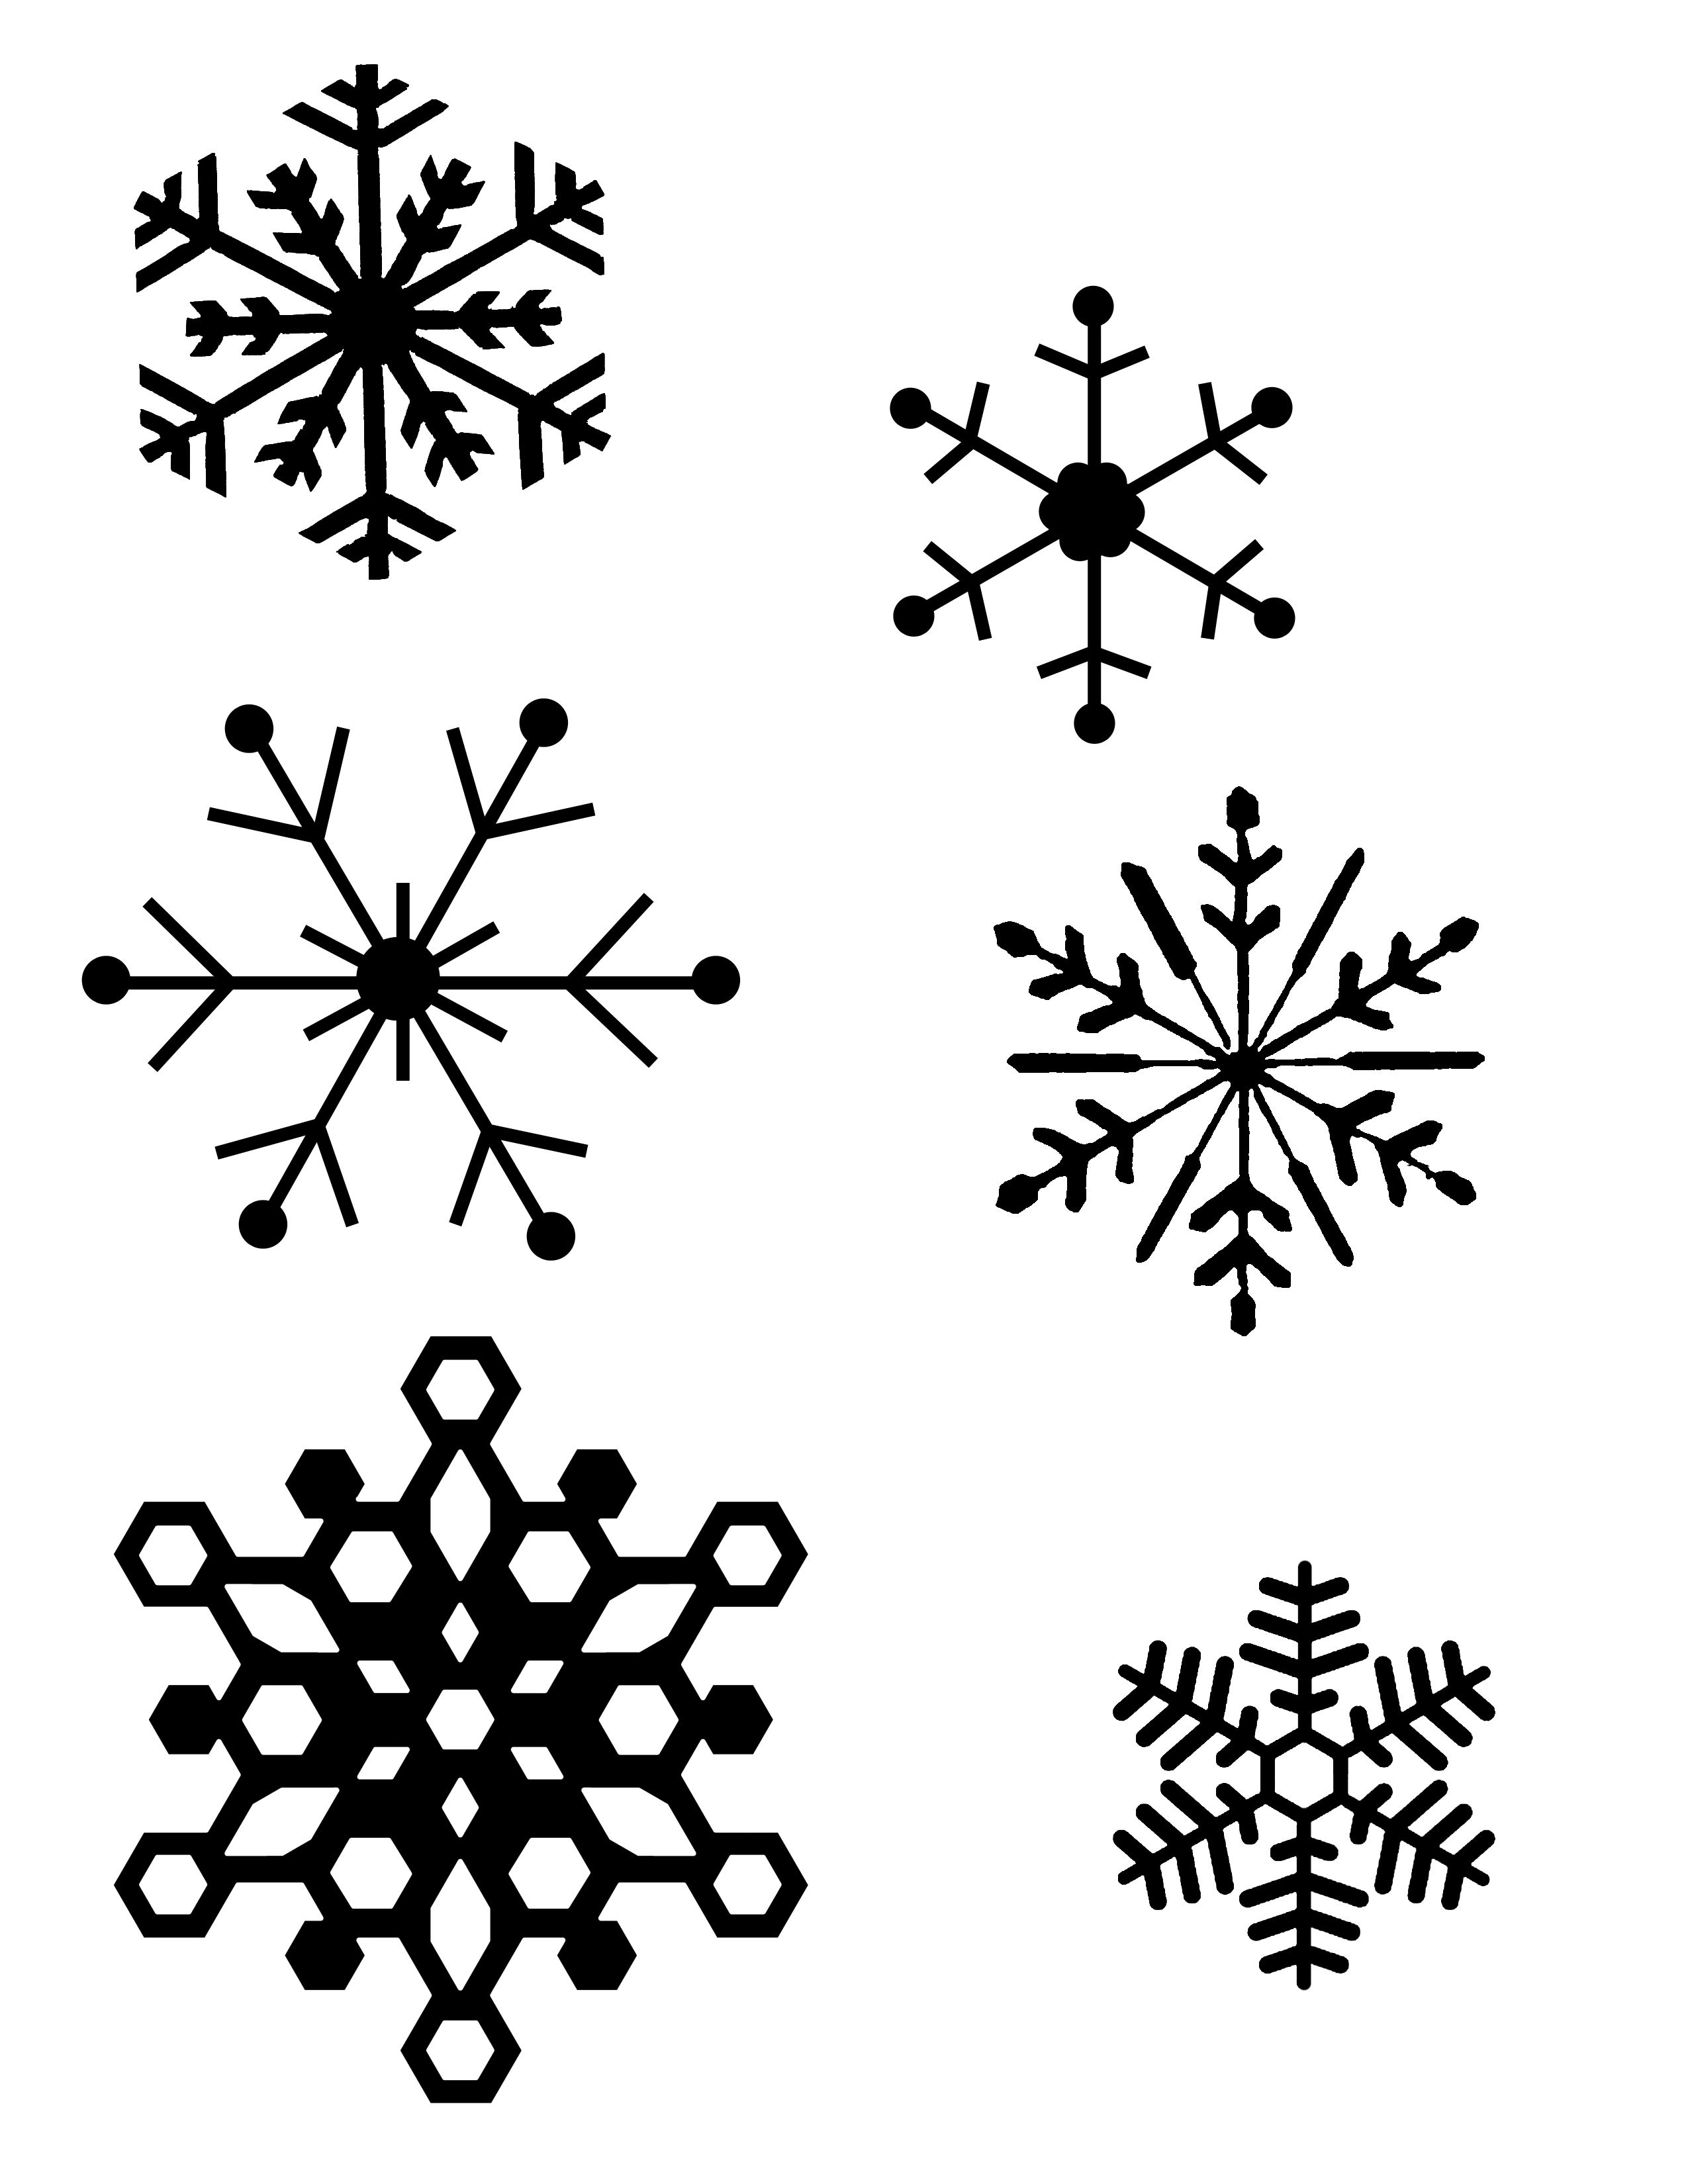 Snowflake Patterns (For Hot Glue Gun Snowflakes) I Think I Will Be - Free Printable Snowflakes